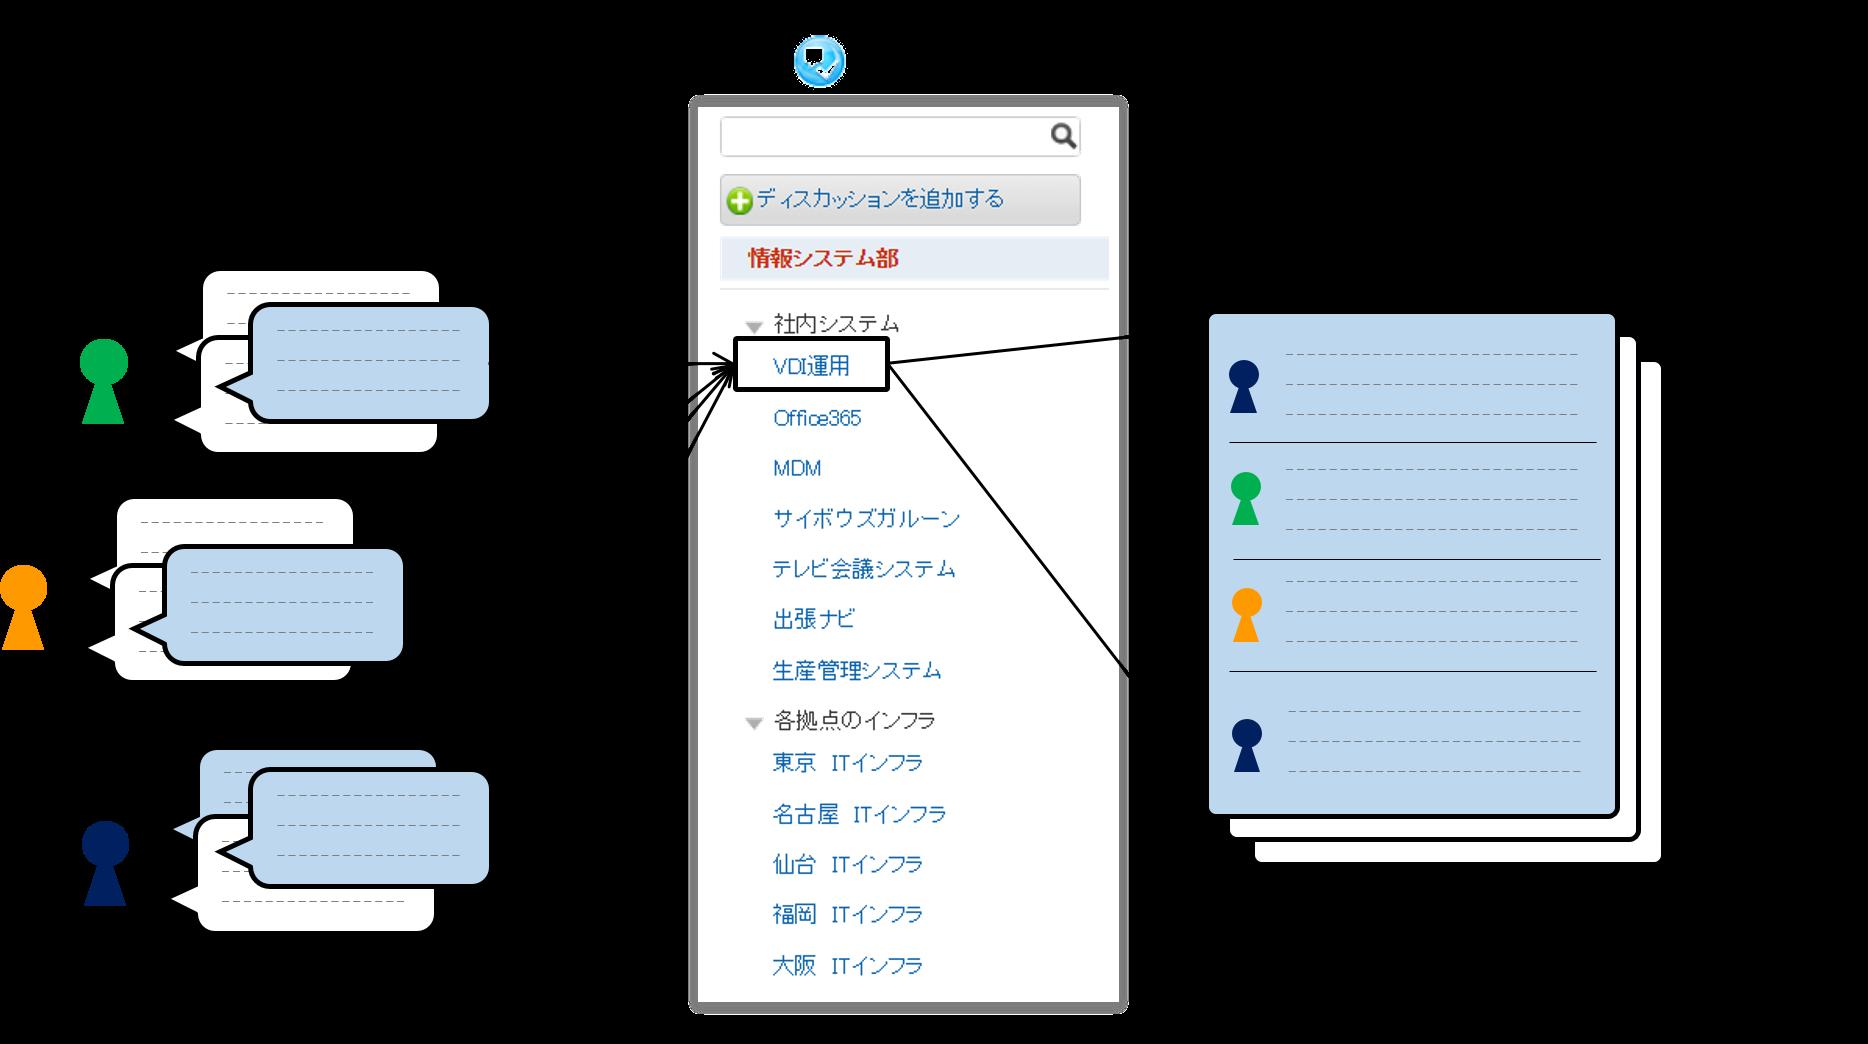 https://enterprise.cybozu.co.jp/d023f589141aaed7f8e84cb8a7e4ef6ebf7661c6.png